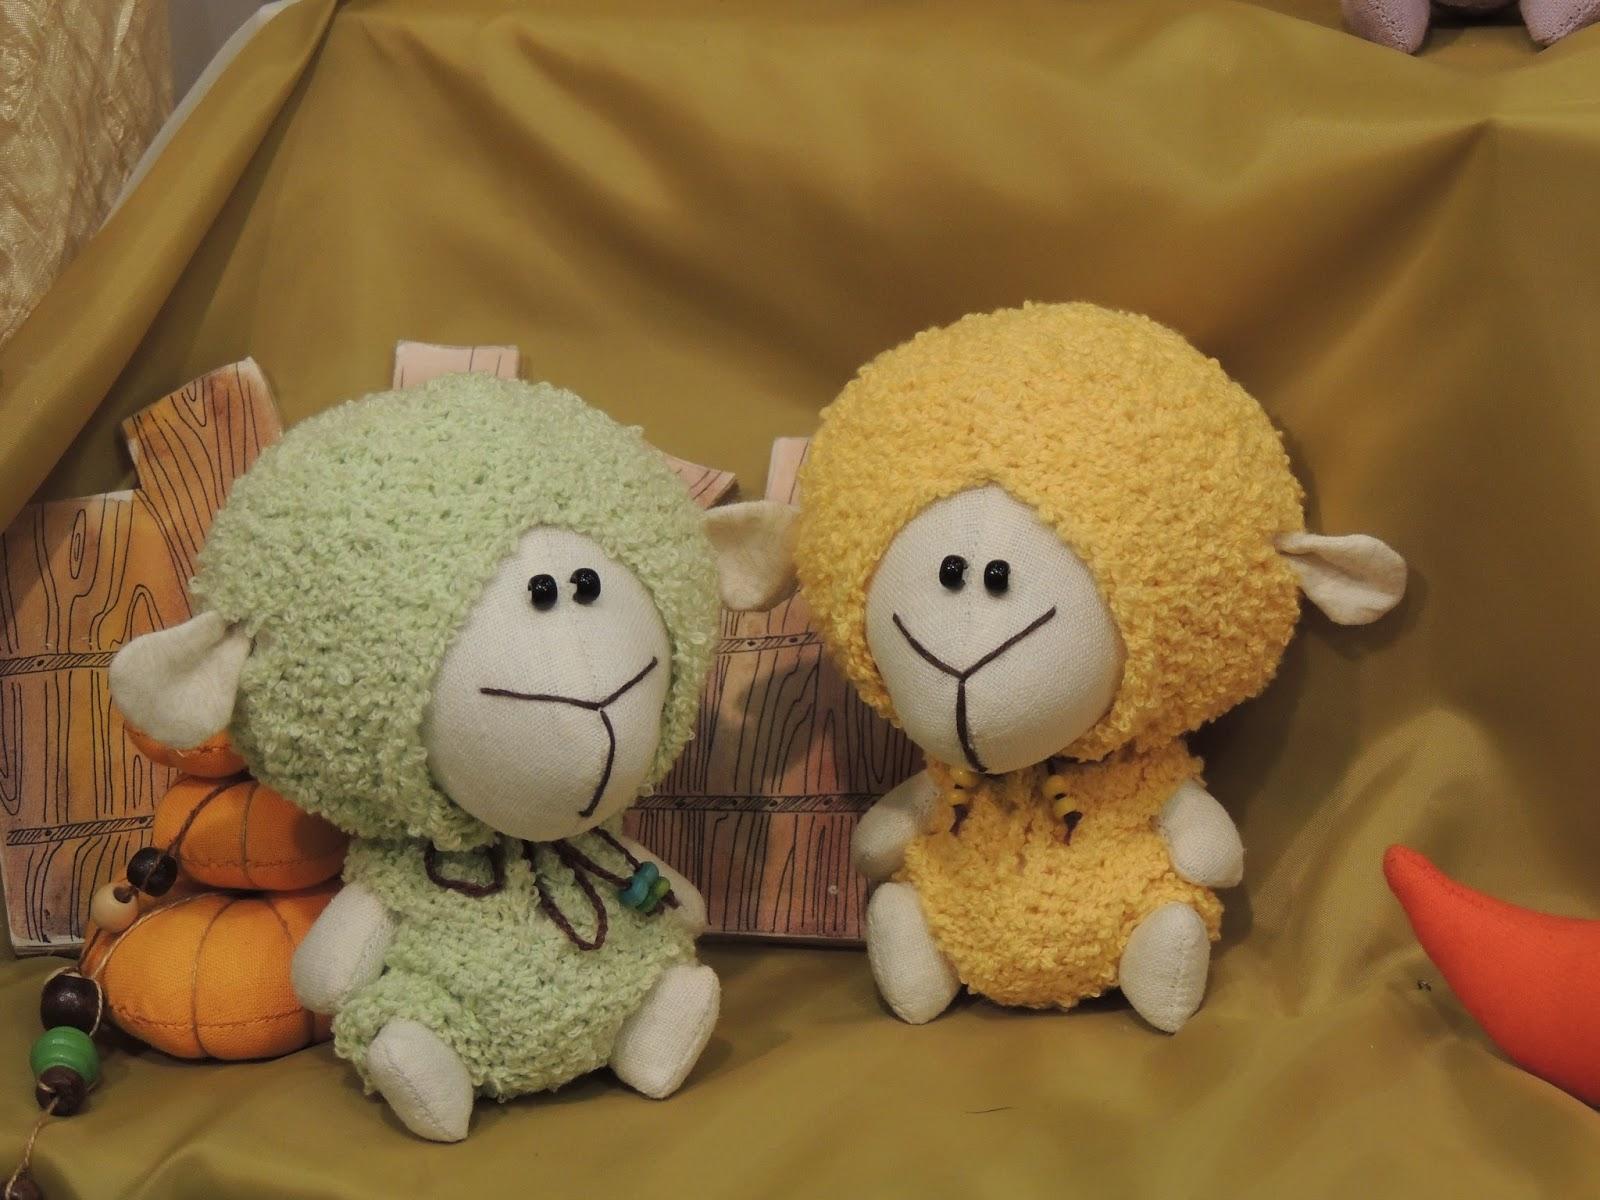 овца,овечка,символ,новый год